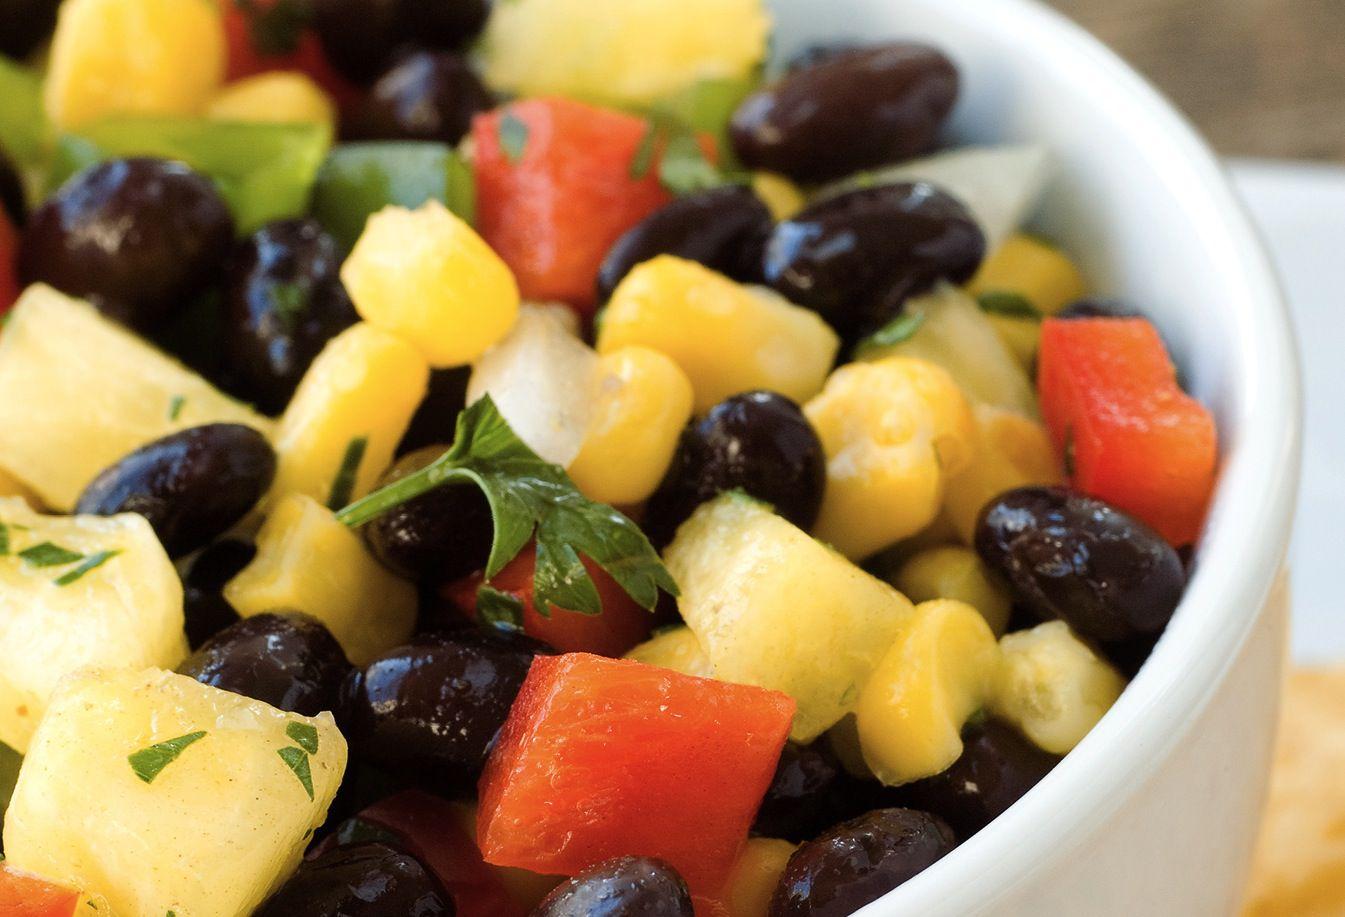 Vegetarian Bean Salad Recipes Perfect for Summer